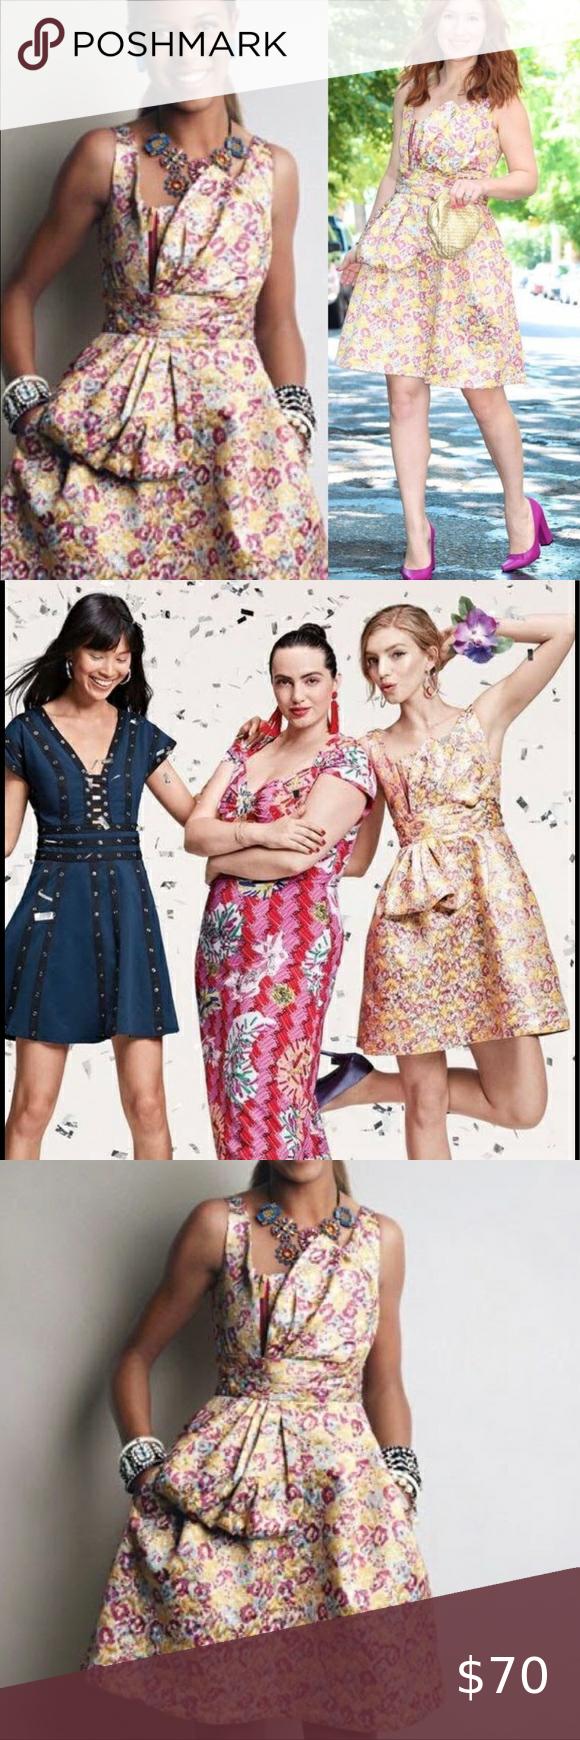 Zac Posen Target Brocade Party Dress Size 14 Size 14 Dresses Dresses Party Dress [ 1740 x 580 Pixel ]